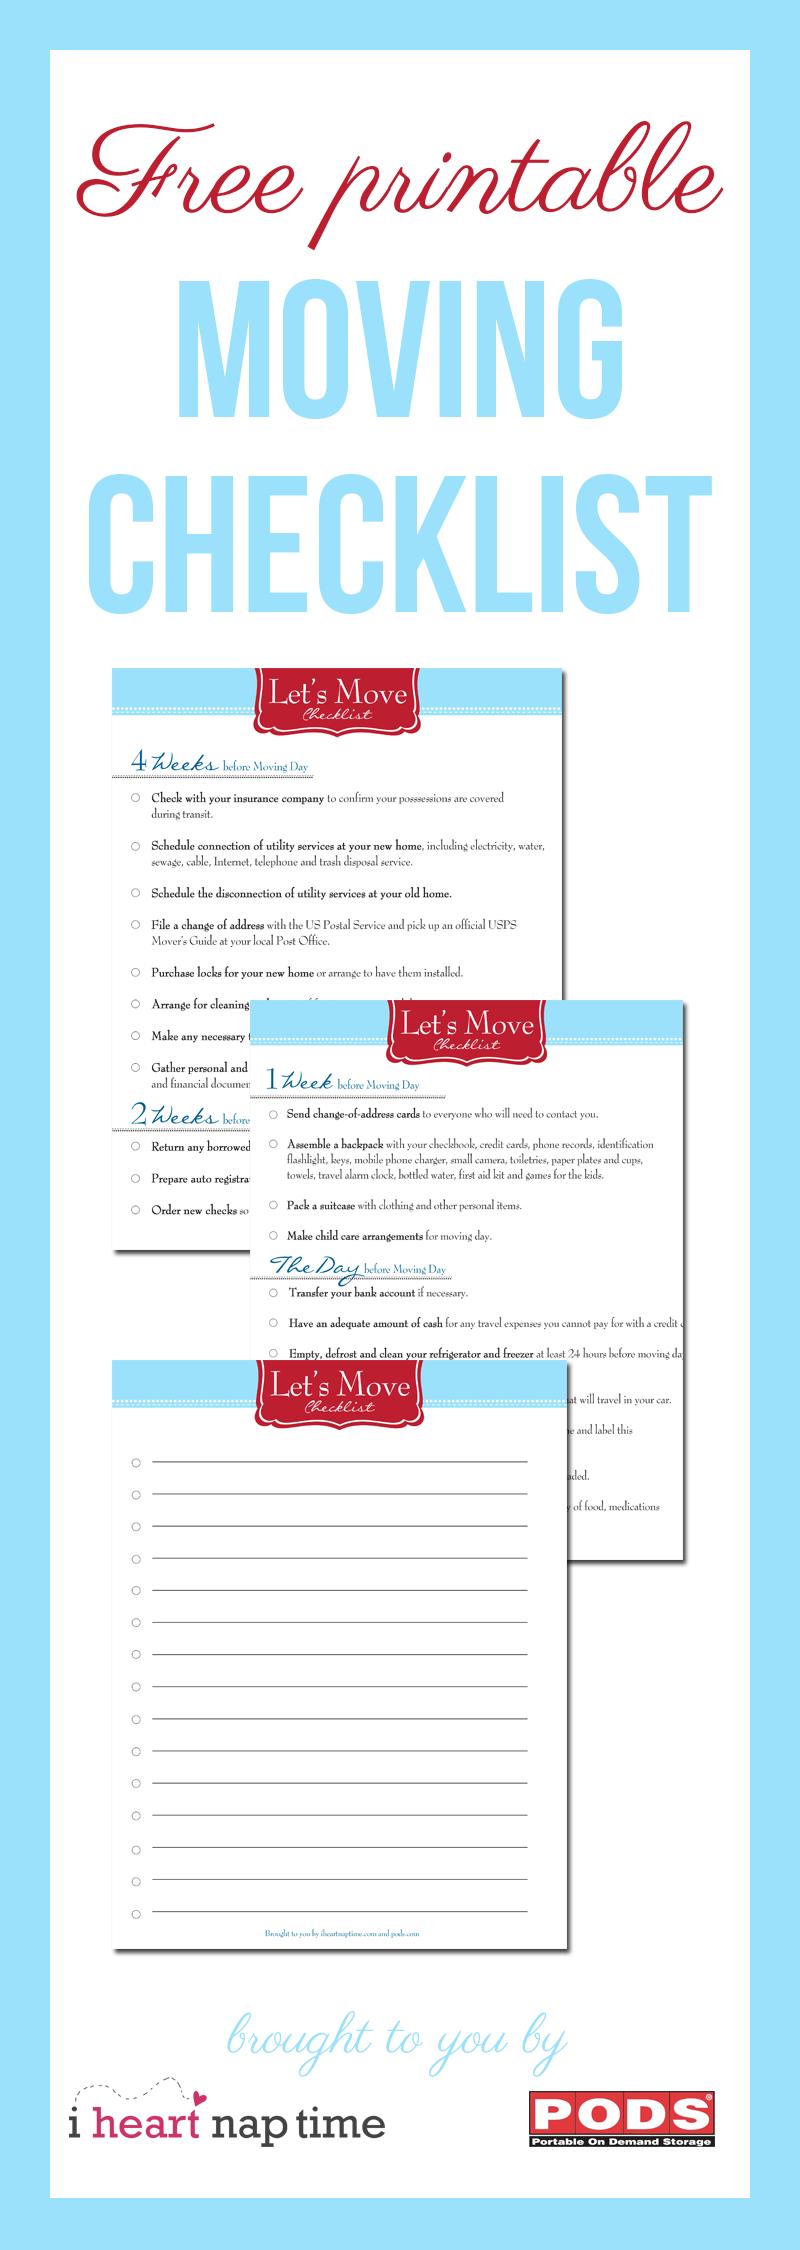 Free Printable Moving Checklist - I Heart Nap Time - Free Printable Moving Checklist And Planner